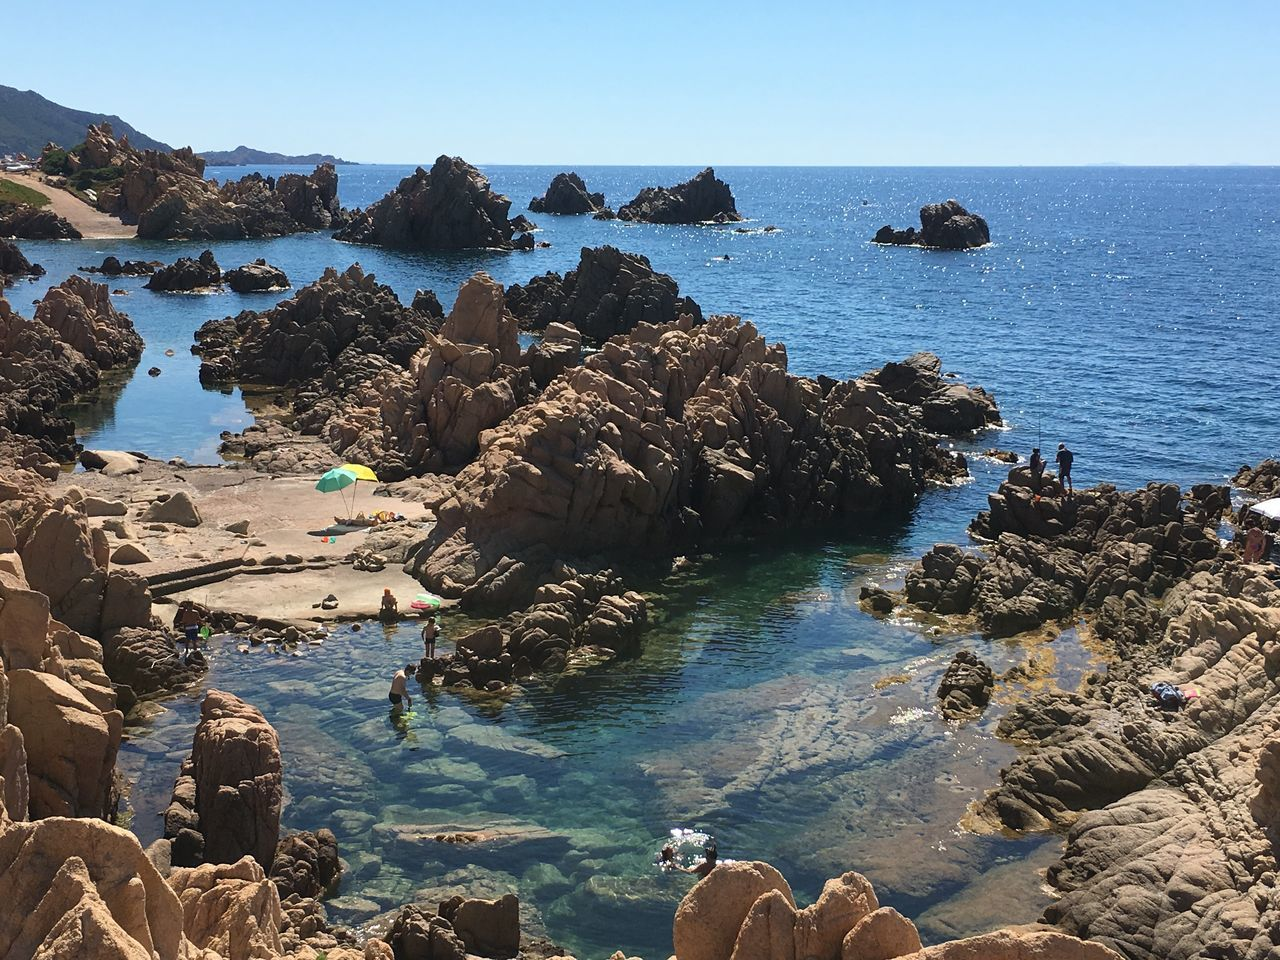 Beach Beauty In Nature Costa Paradiso Nature Outdoors Rock Formation Sardegna Sardinia Scenics Sea Sky Sunlight Water